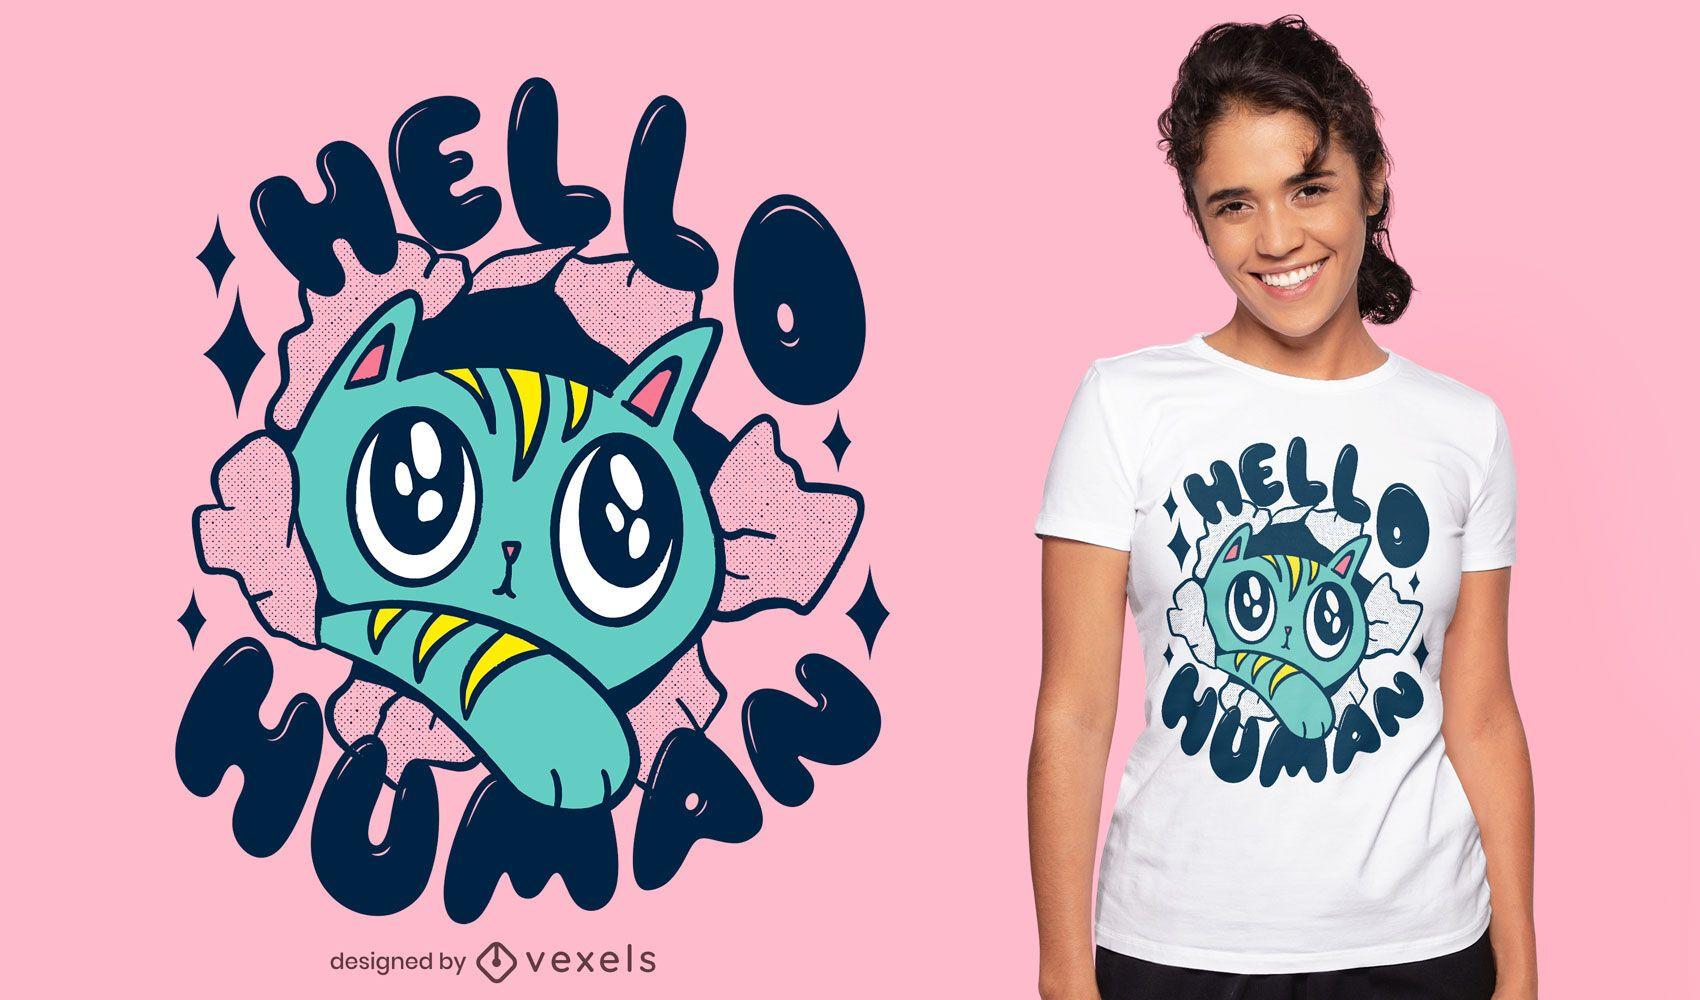 Cute cat saying hello t-shirt design